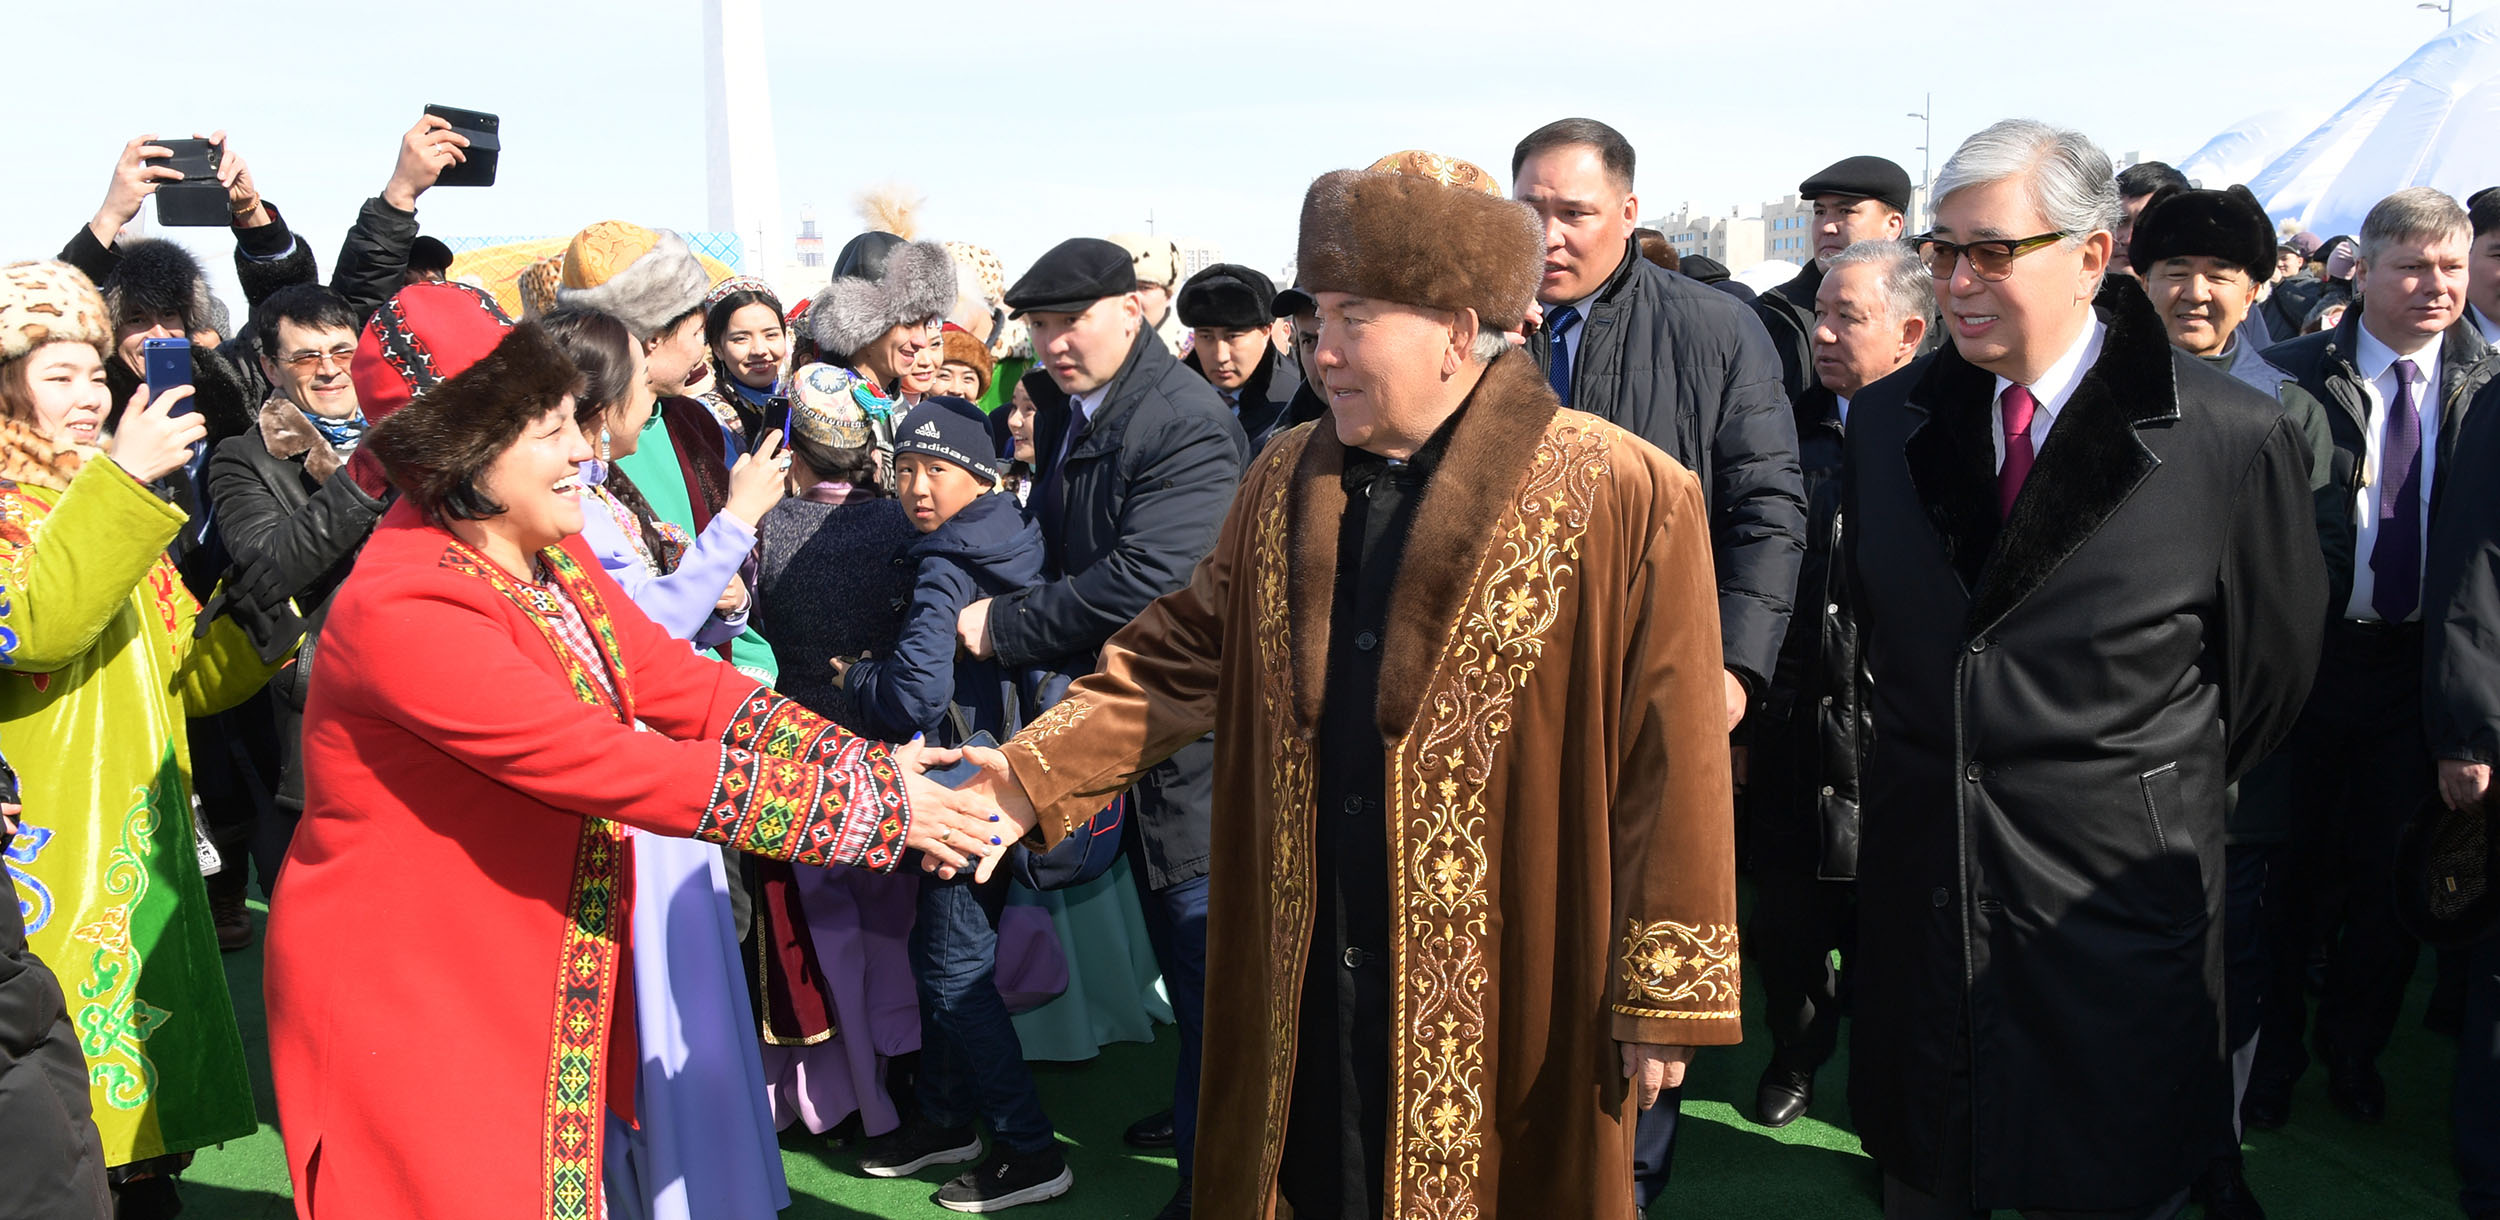 Noursoultan Nazarbaïev Kassym-Jomart Tokaïev Kazakhstan Histoire